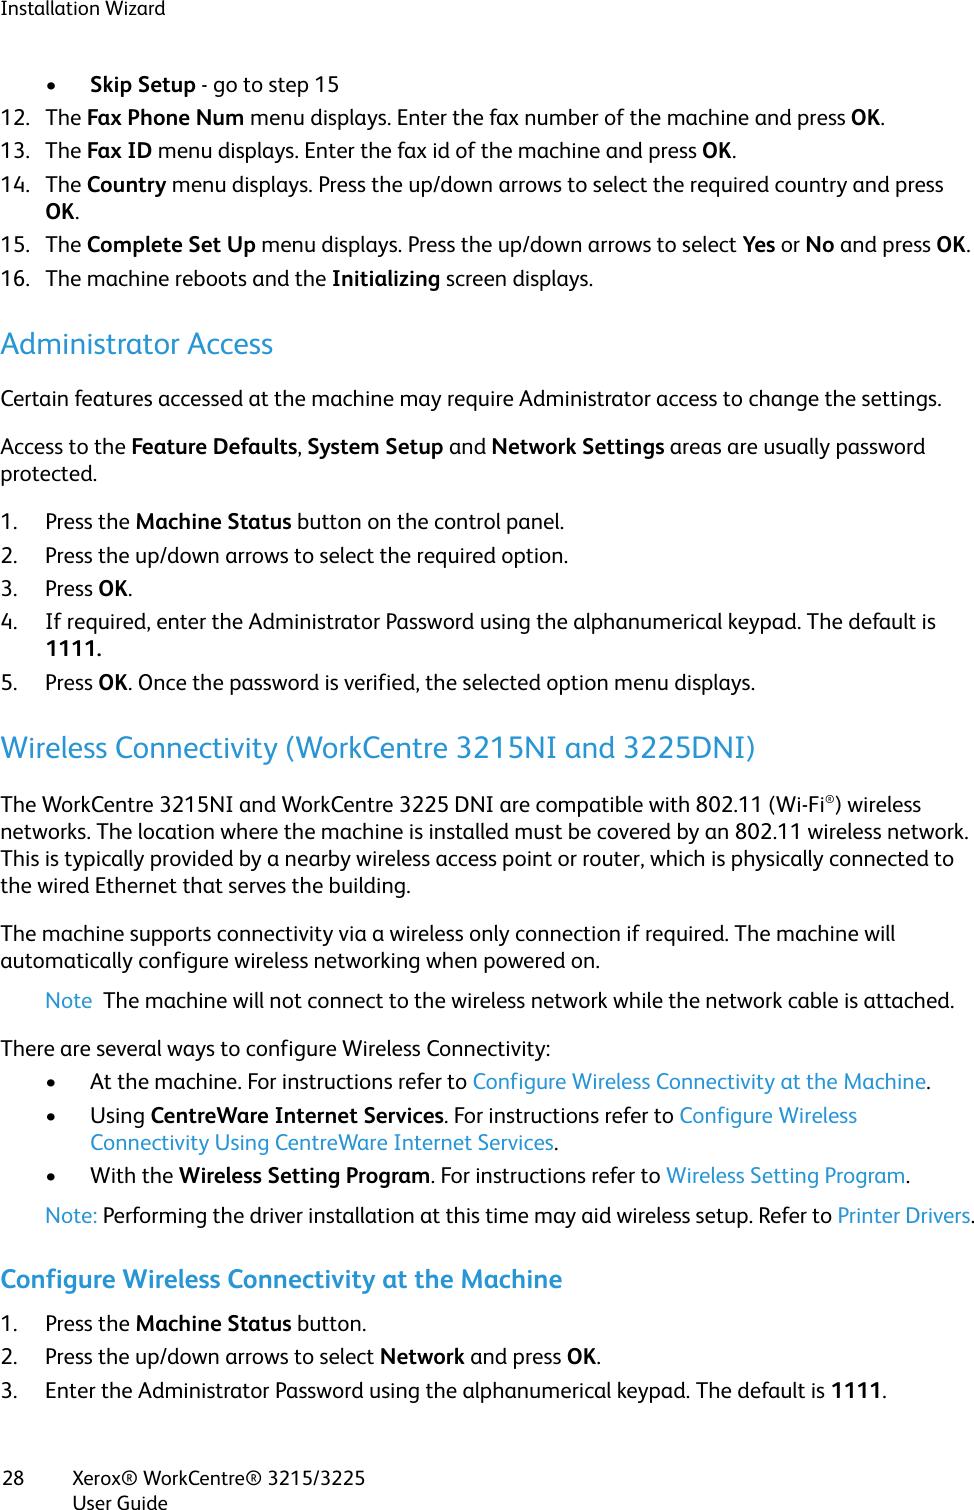 Xerox Workcentre 3215 Users Manual 01_WC3215_3225